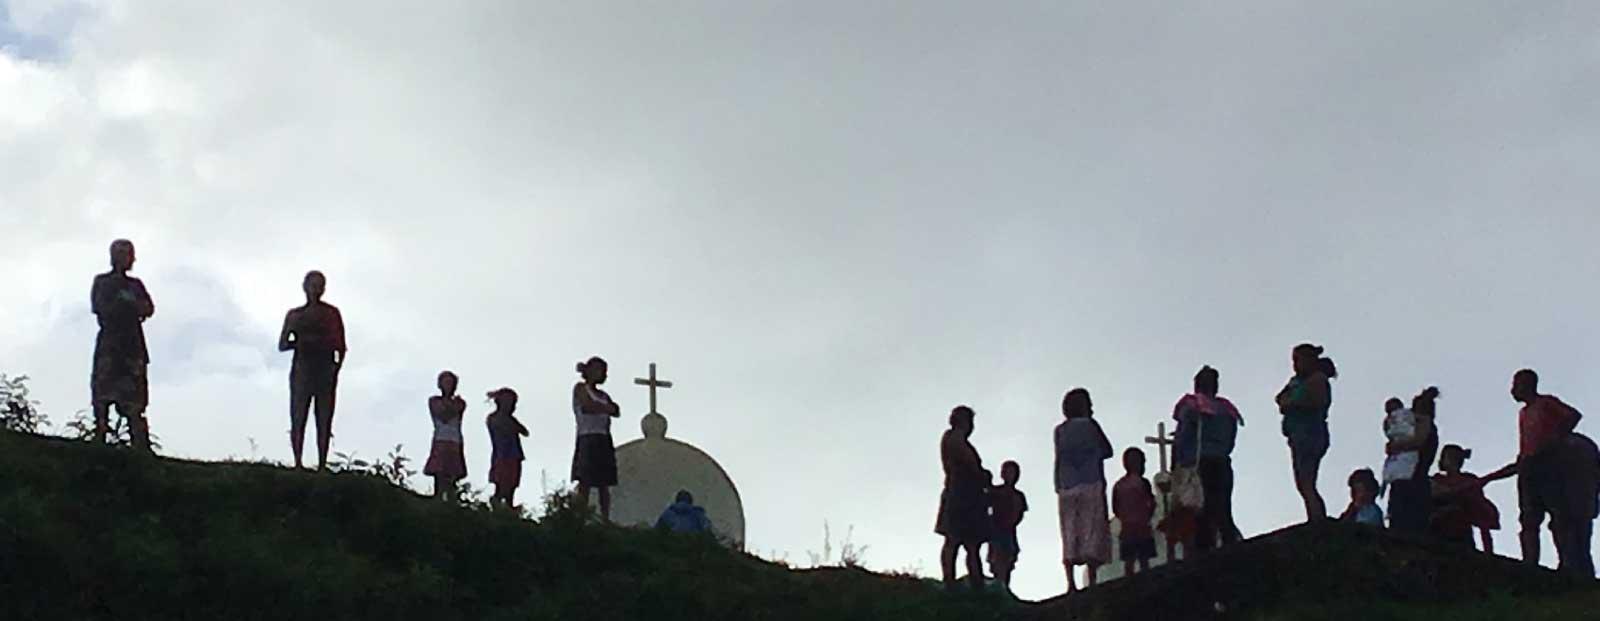 Miskitu villagers on the banks of Rio Coco. November 2018